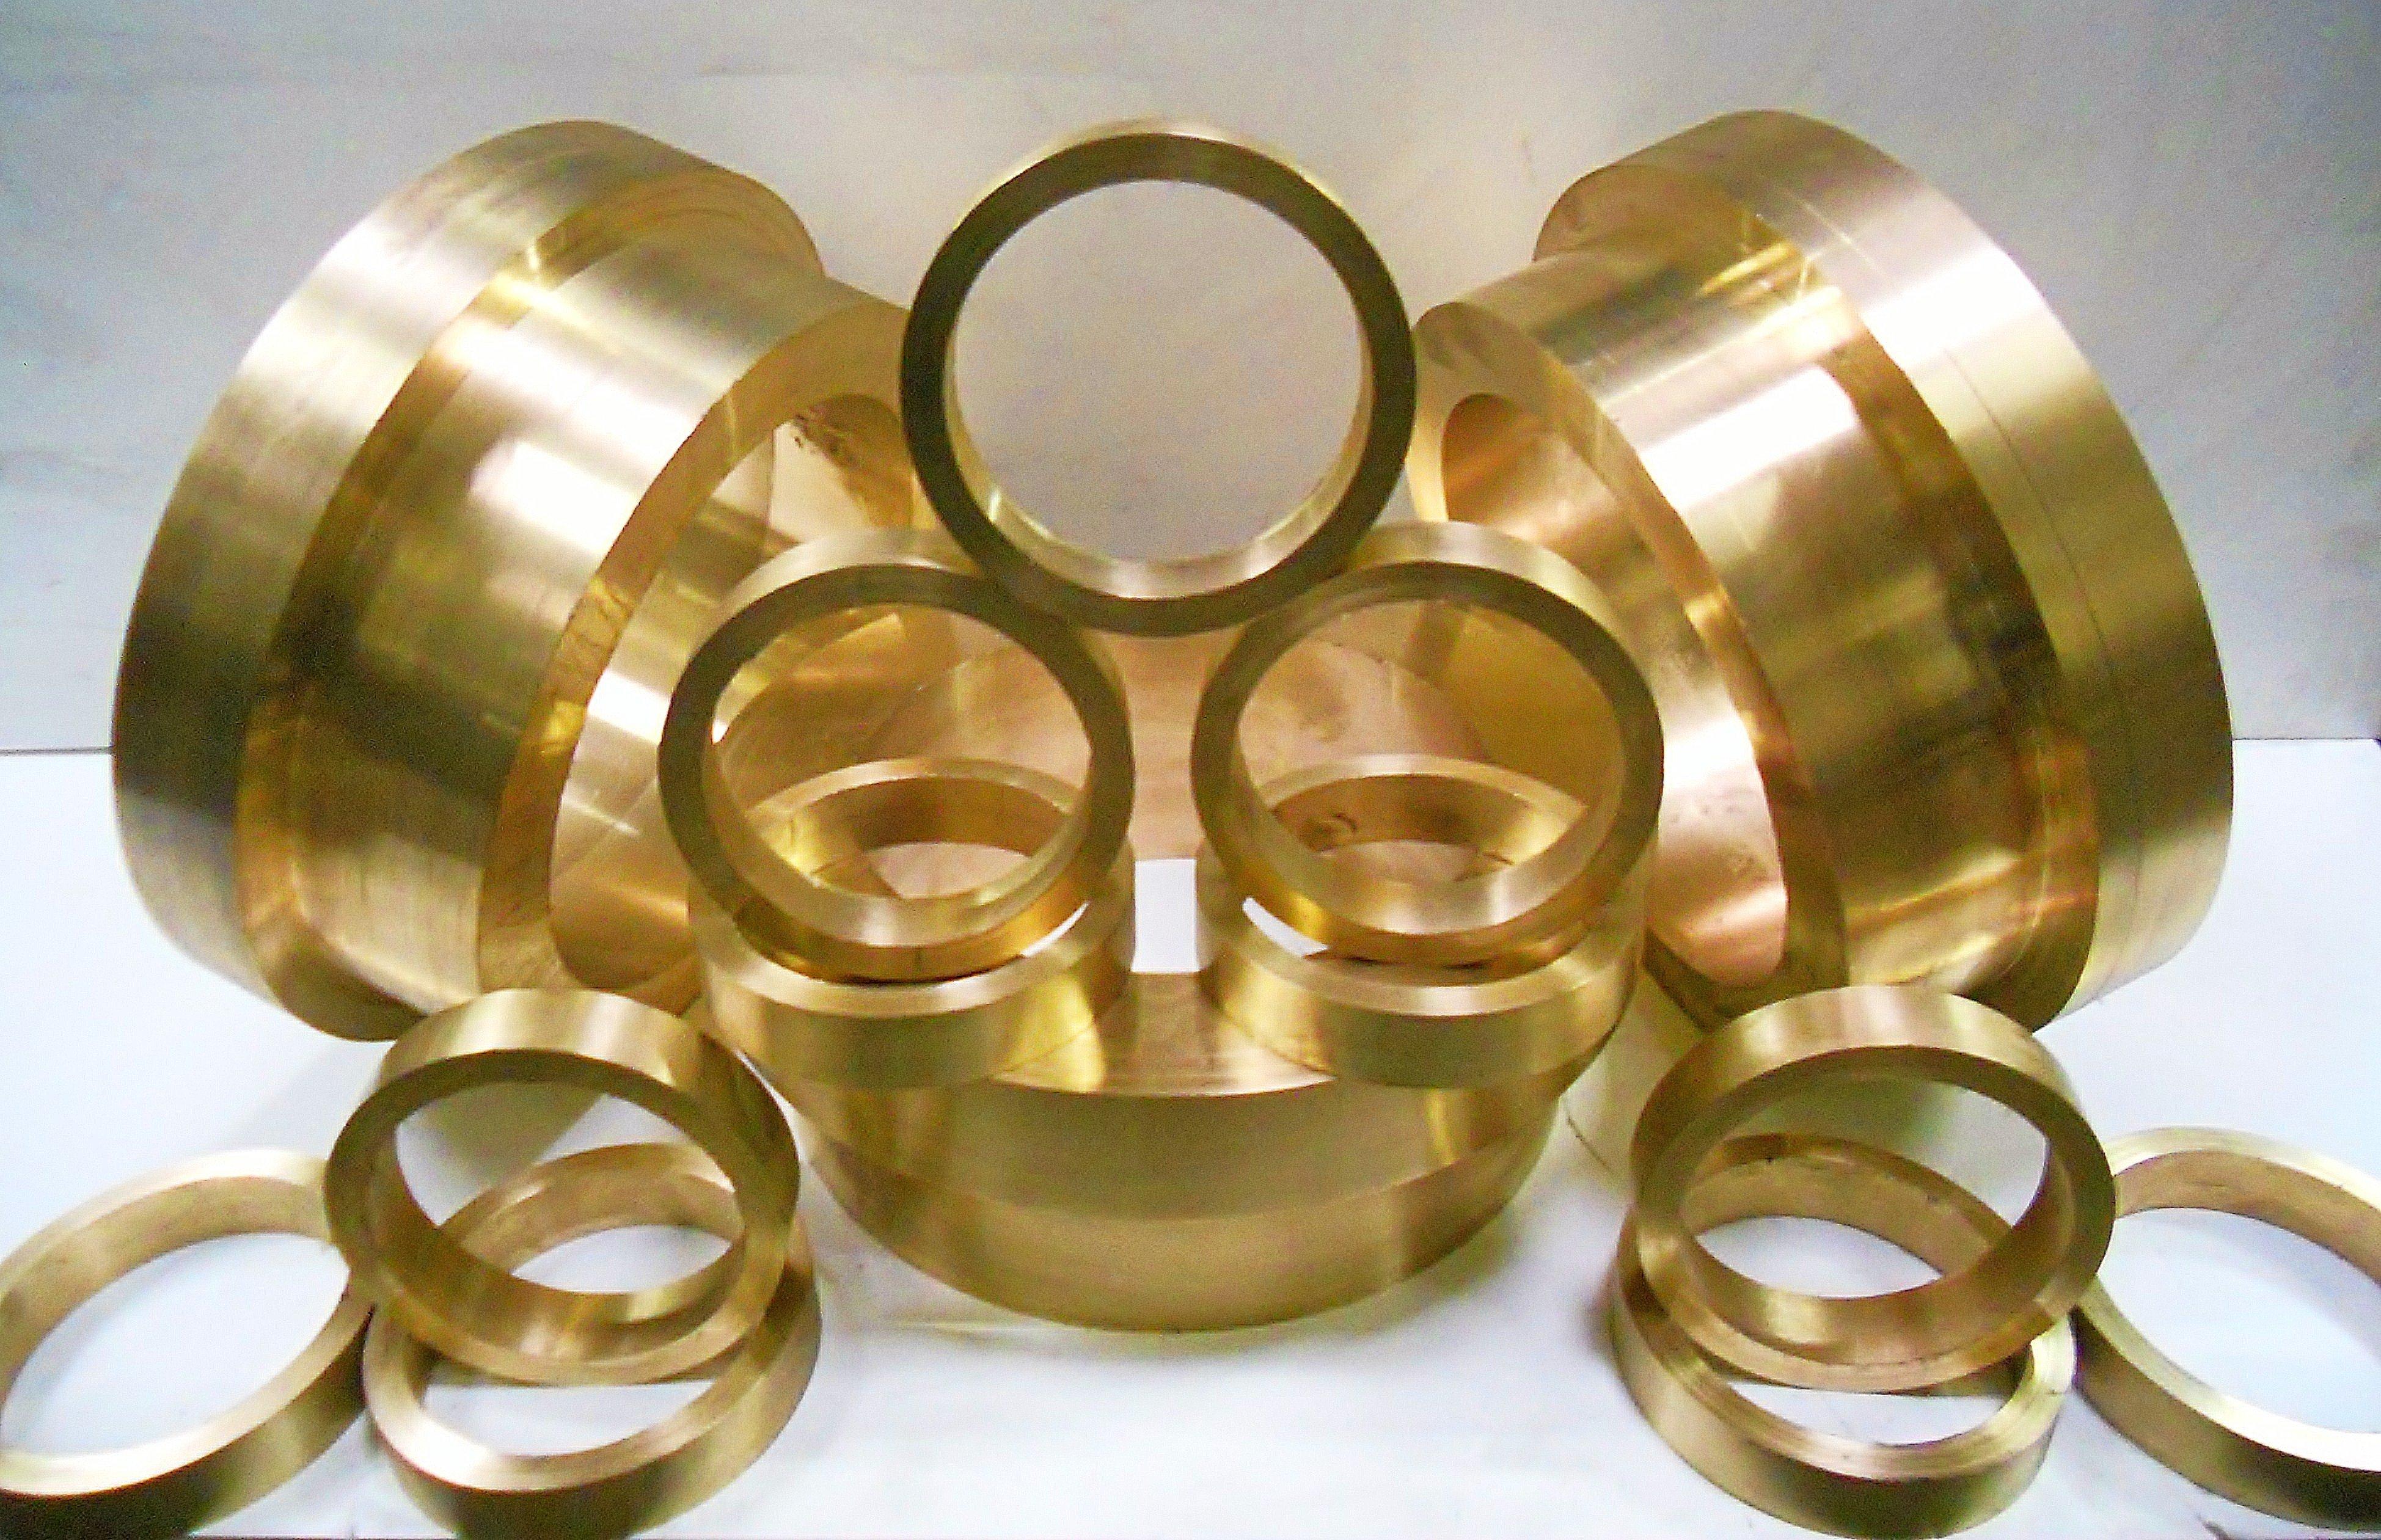 phosphor bronze grades casting